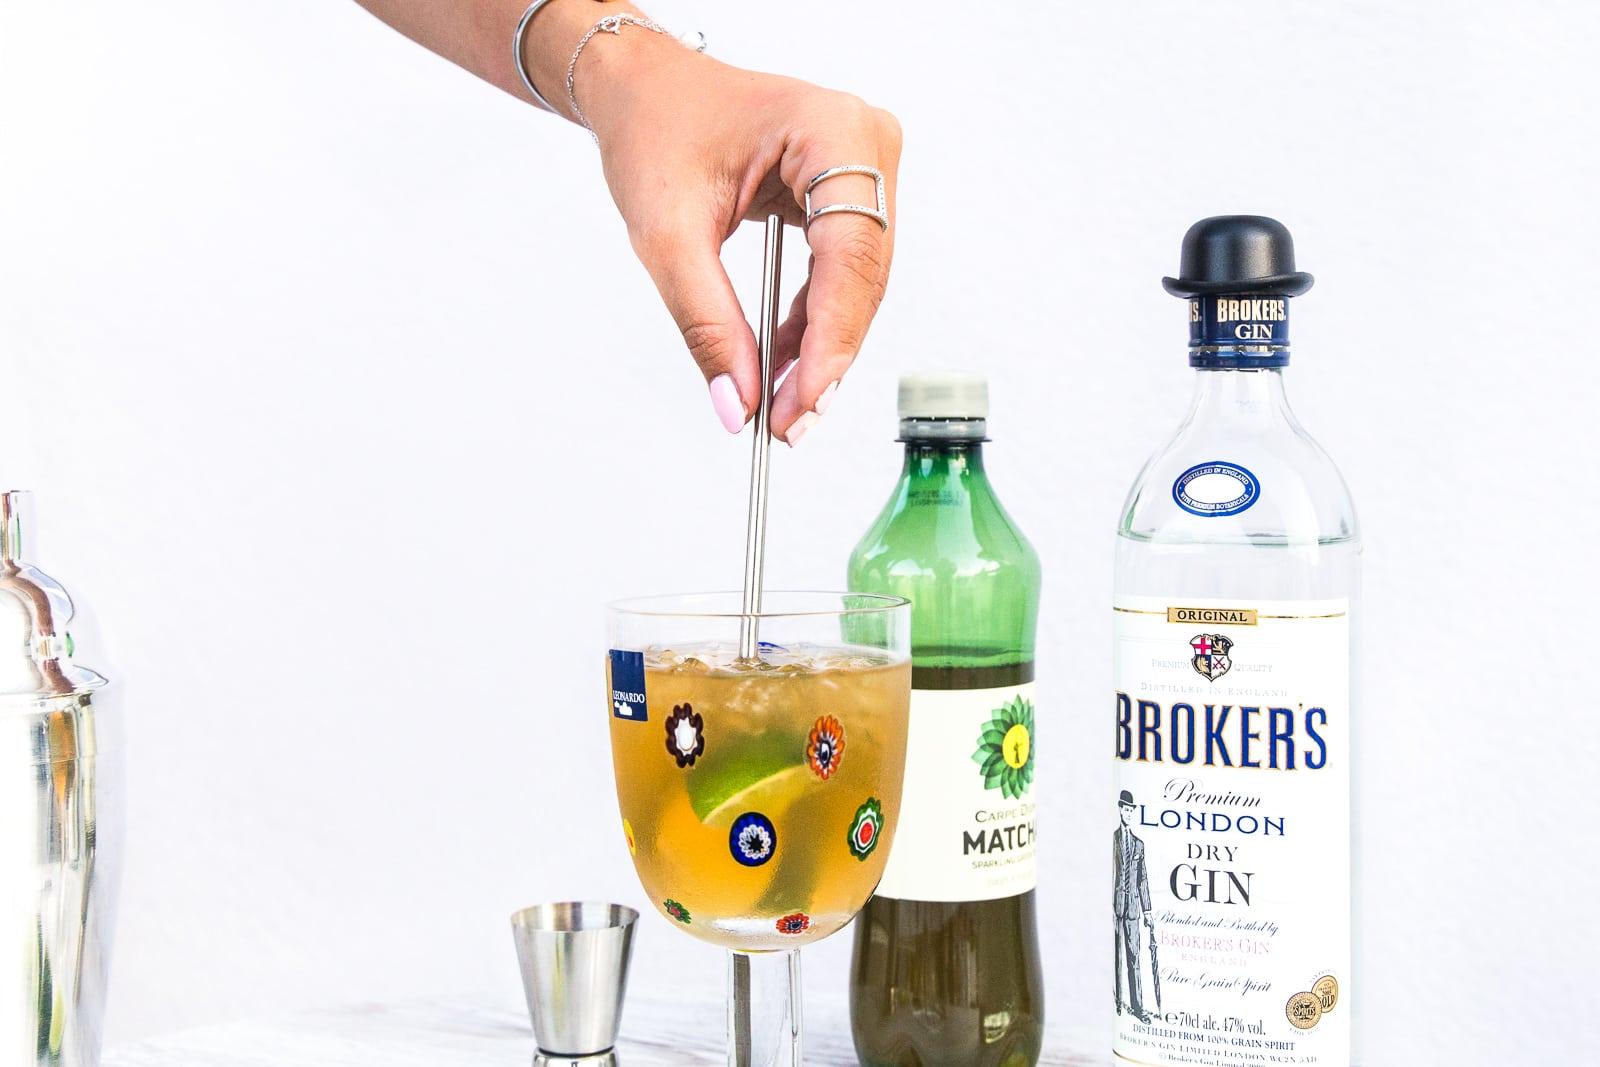 Matcha als Cocktail-Trend: Matcha Mule mit Carpe Diem